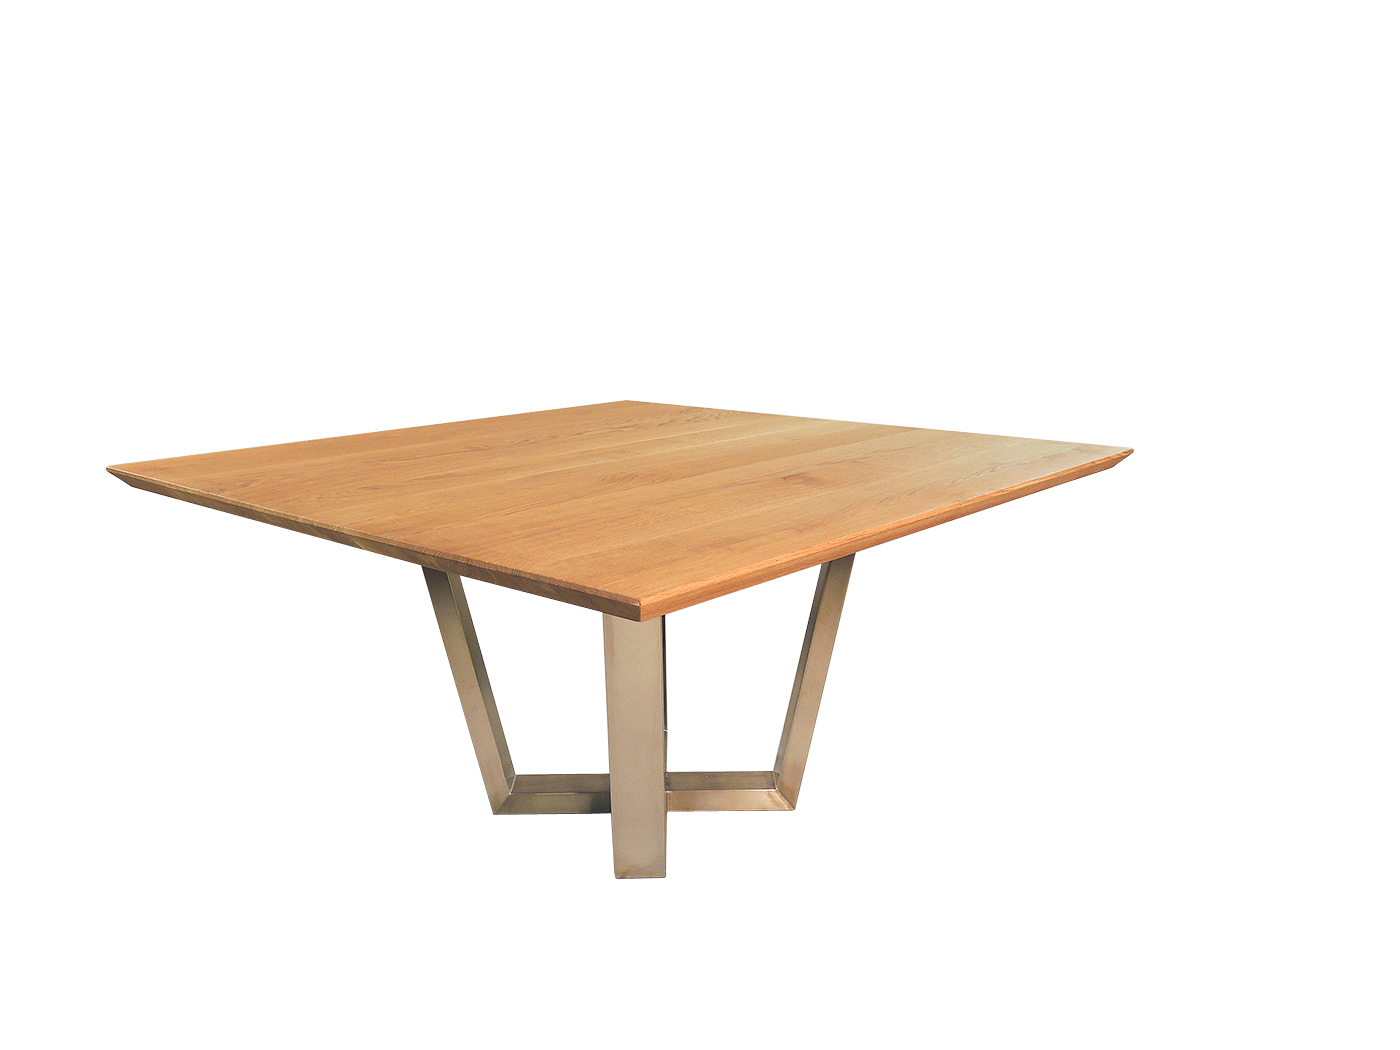 Vierkante Eettafel 150x150 Cm.Hampton Moderne Vierkante Tafel